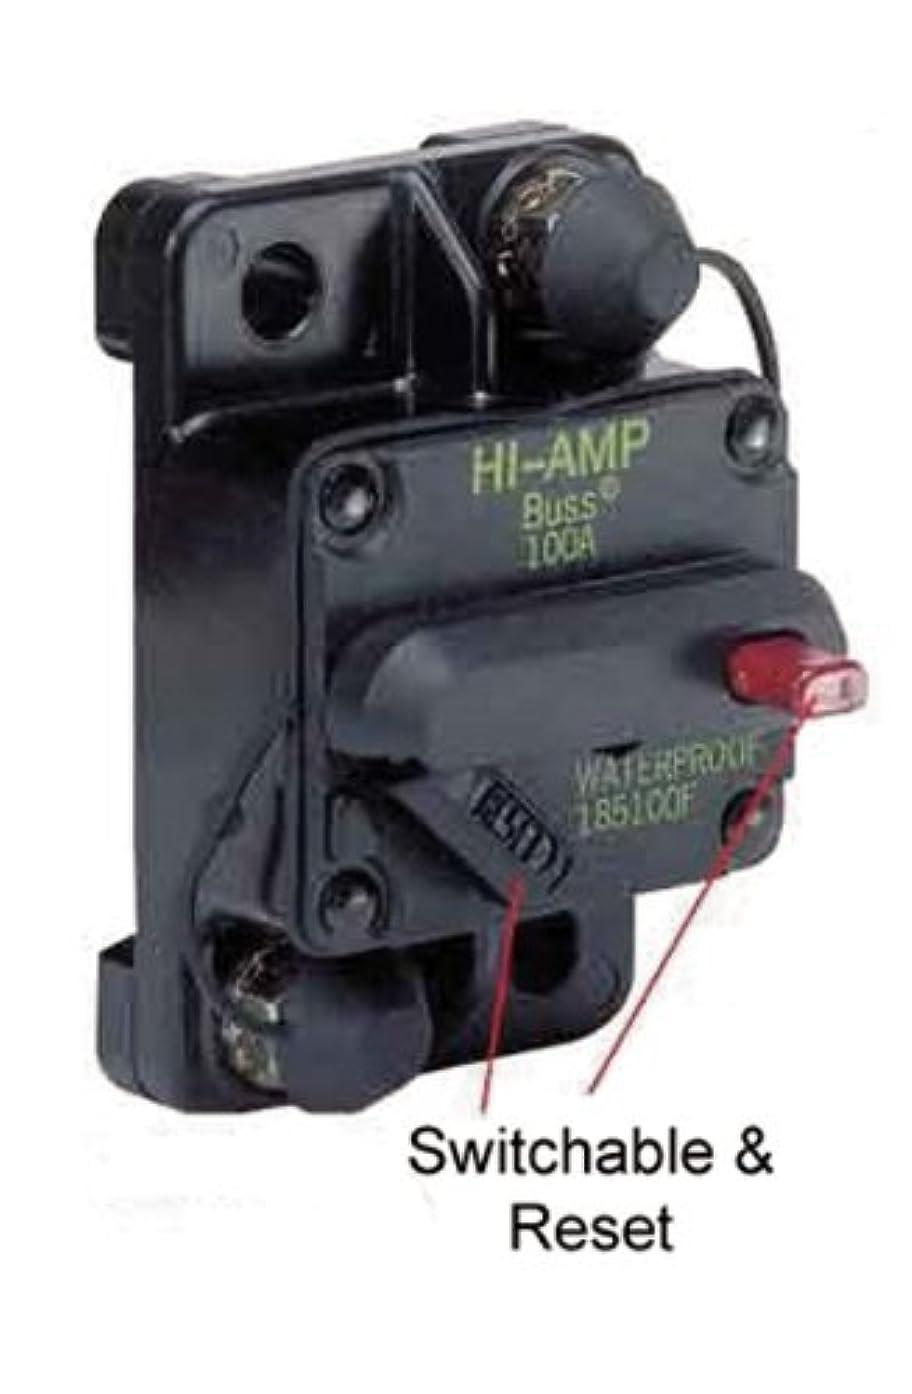 Marinco 185050F-01-1 Marine Switchable Reset Circuit Breaker-50 Amp, Flush Mount